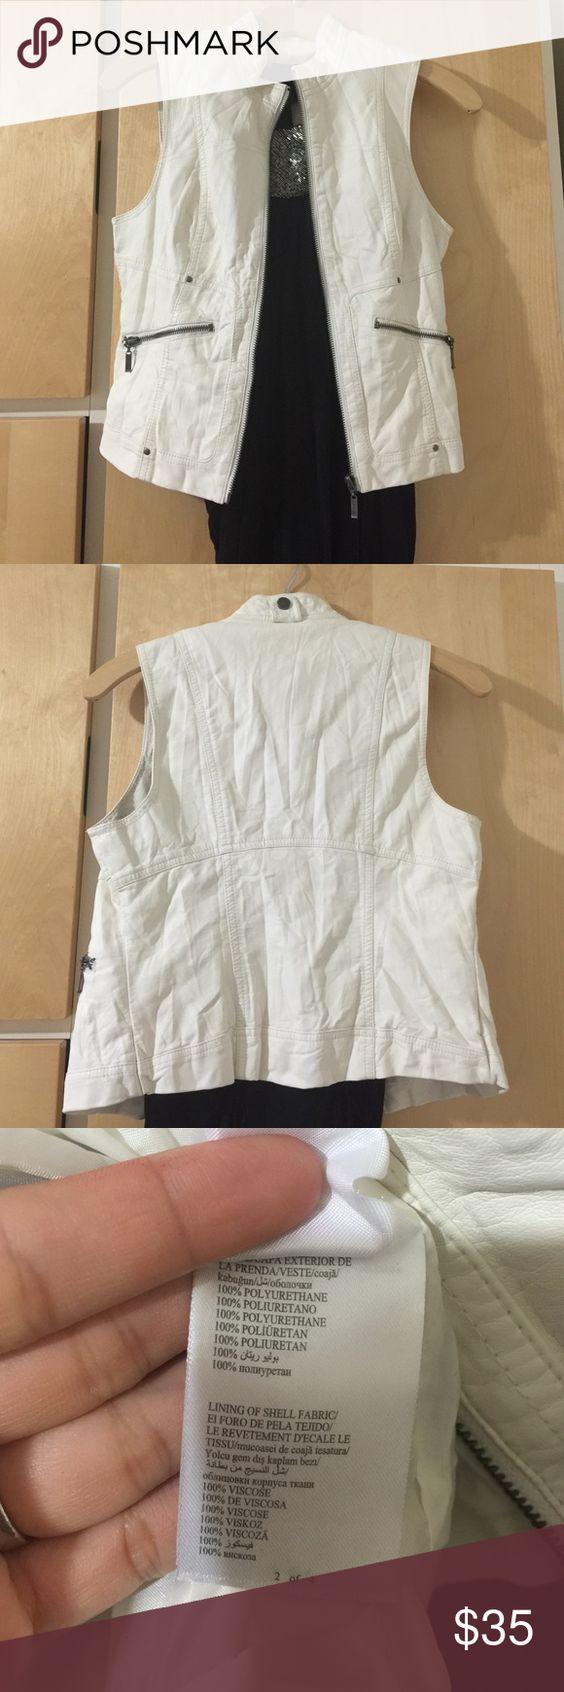 BEBE leather vest jacket. Very nice soft vest jacket from Bebe. Worn once, like new condition. bebe Jackets & Coats Vests